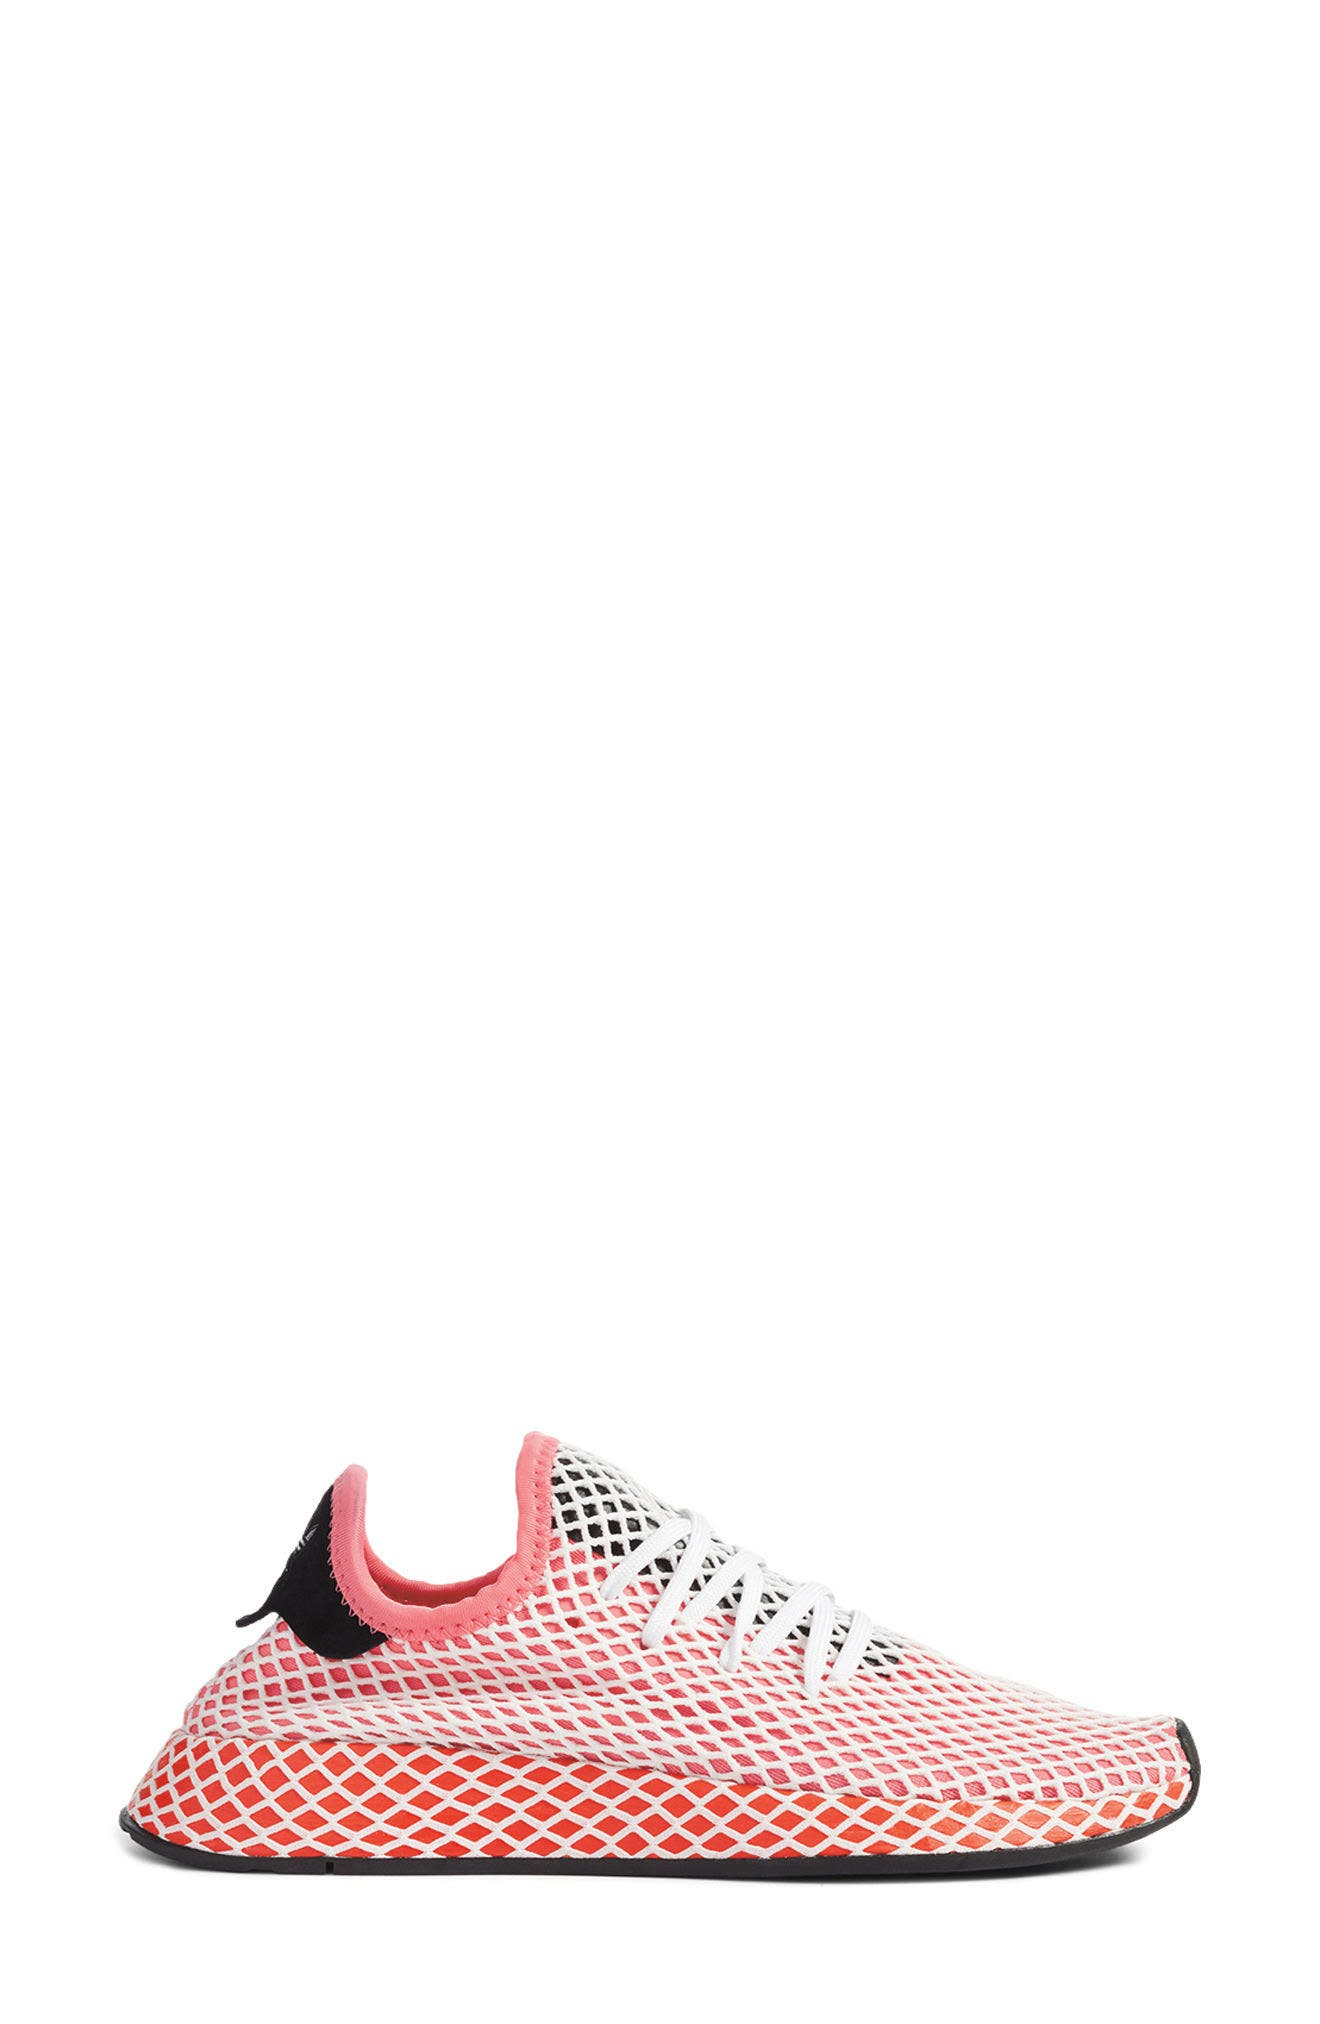 Deerupt Runner Sneaker,                             Alternate thumbnail 10, color,                             GLOW/ GLOW/ CLEAR LILAC